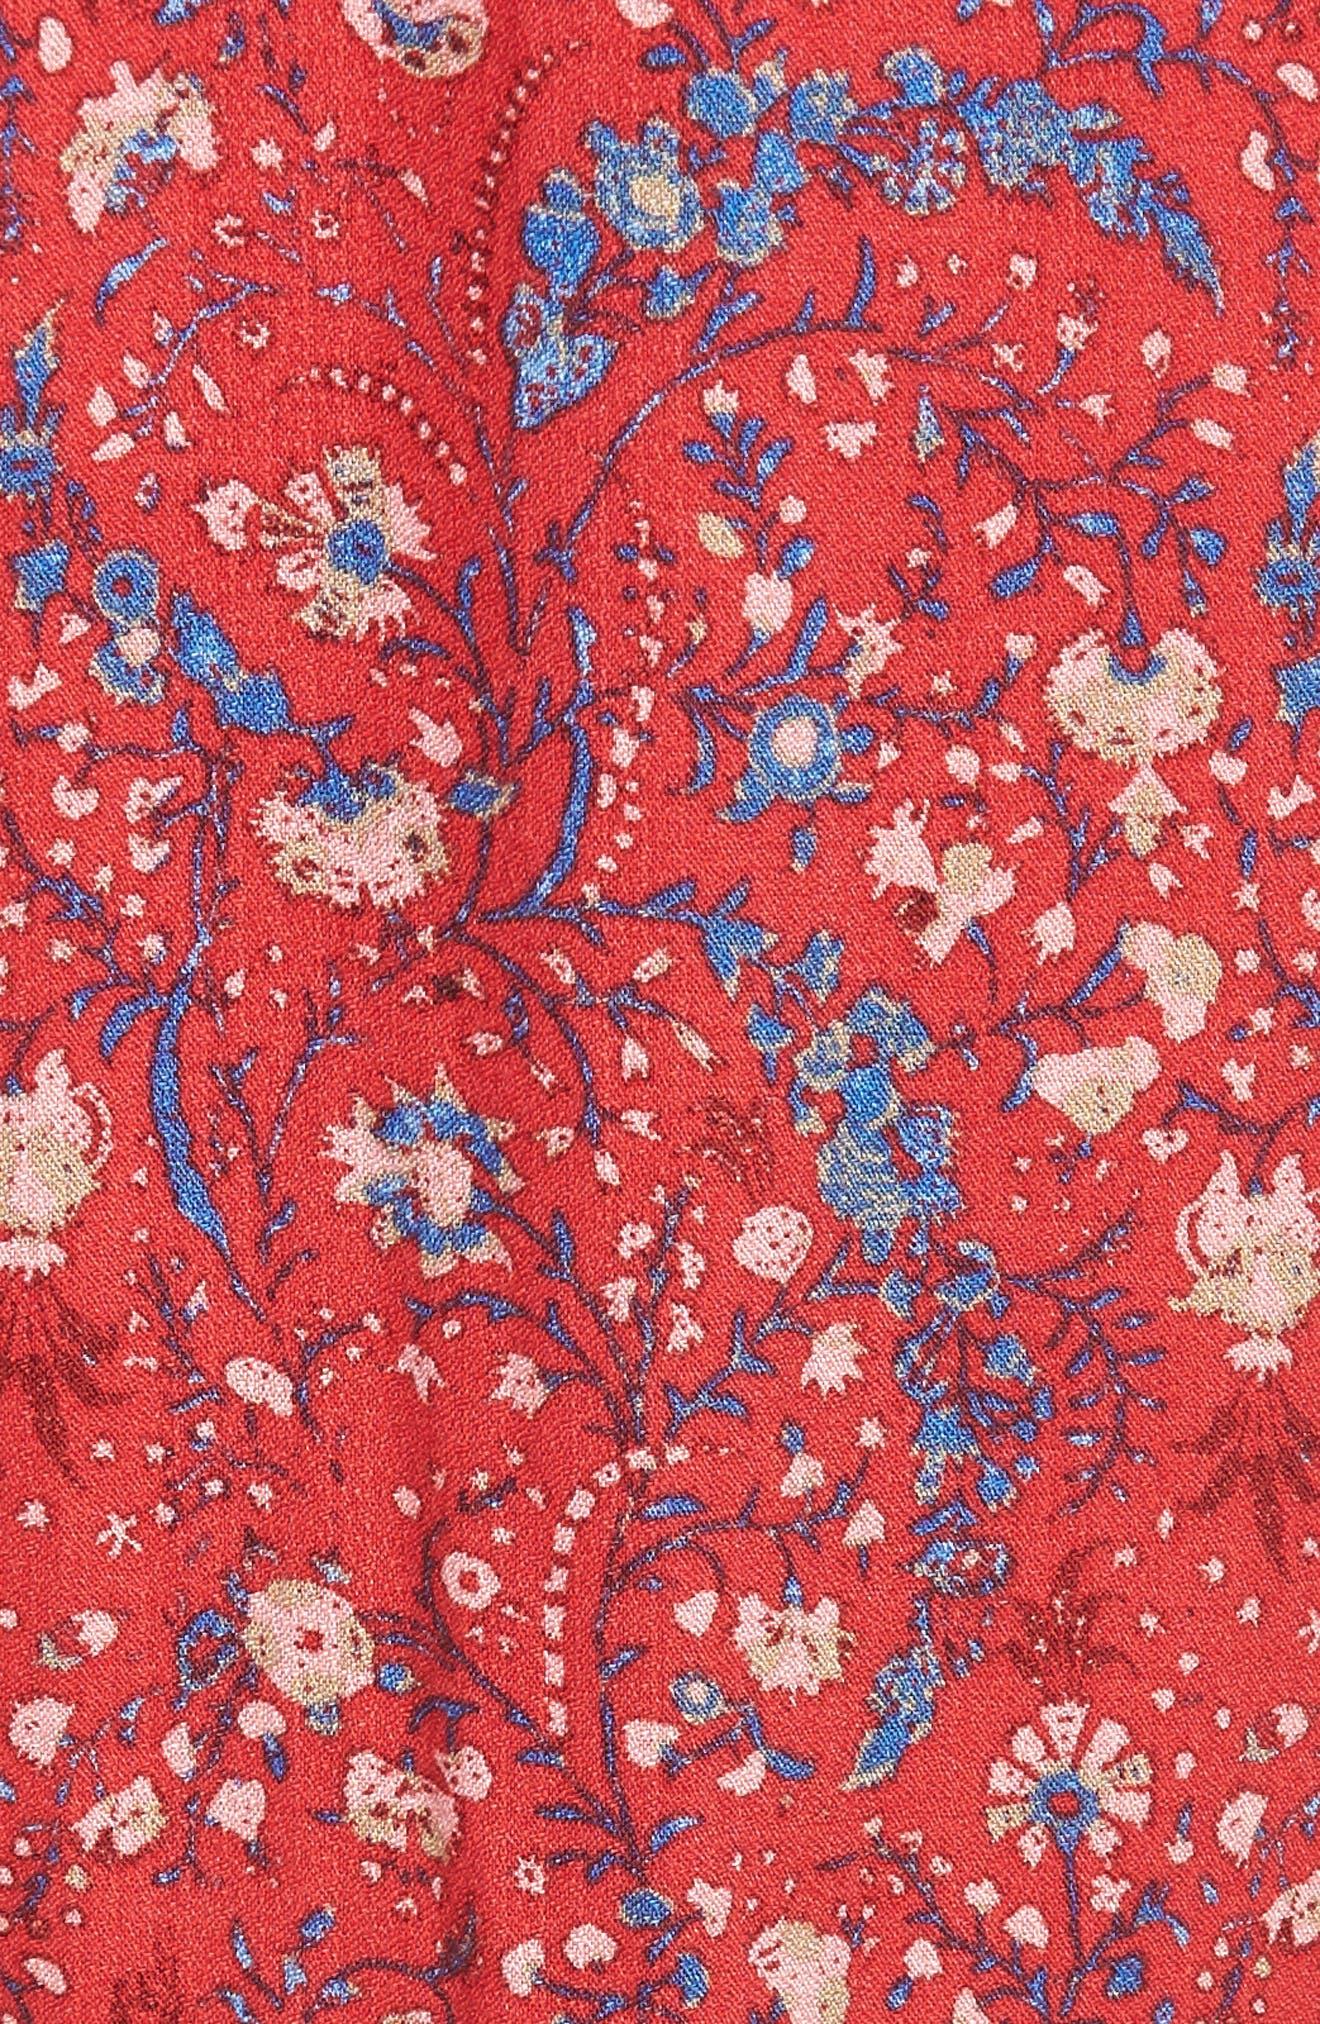 Off the Shoulder Floral Dress,                             Alternate thumbnail 5, color,                             Red Multi